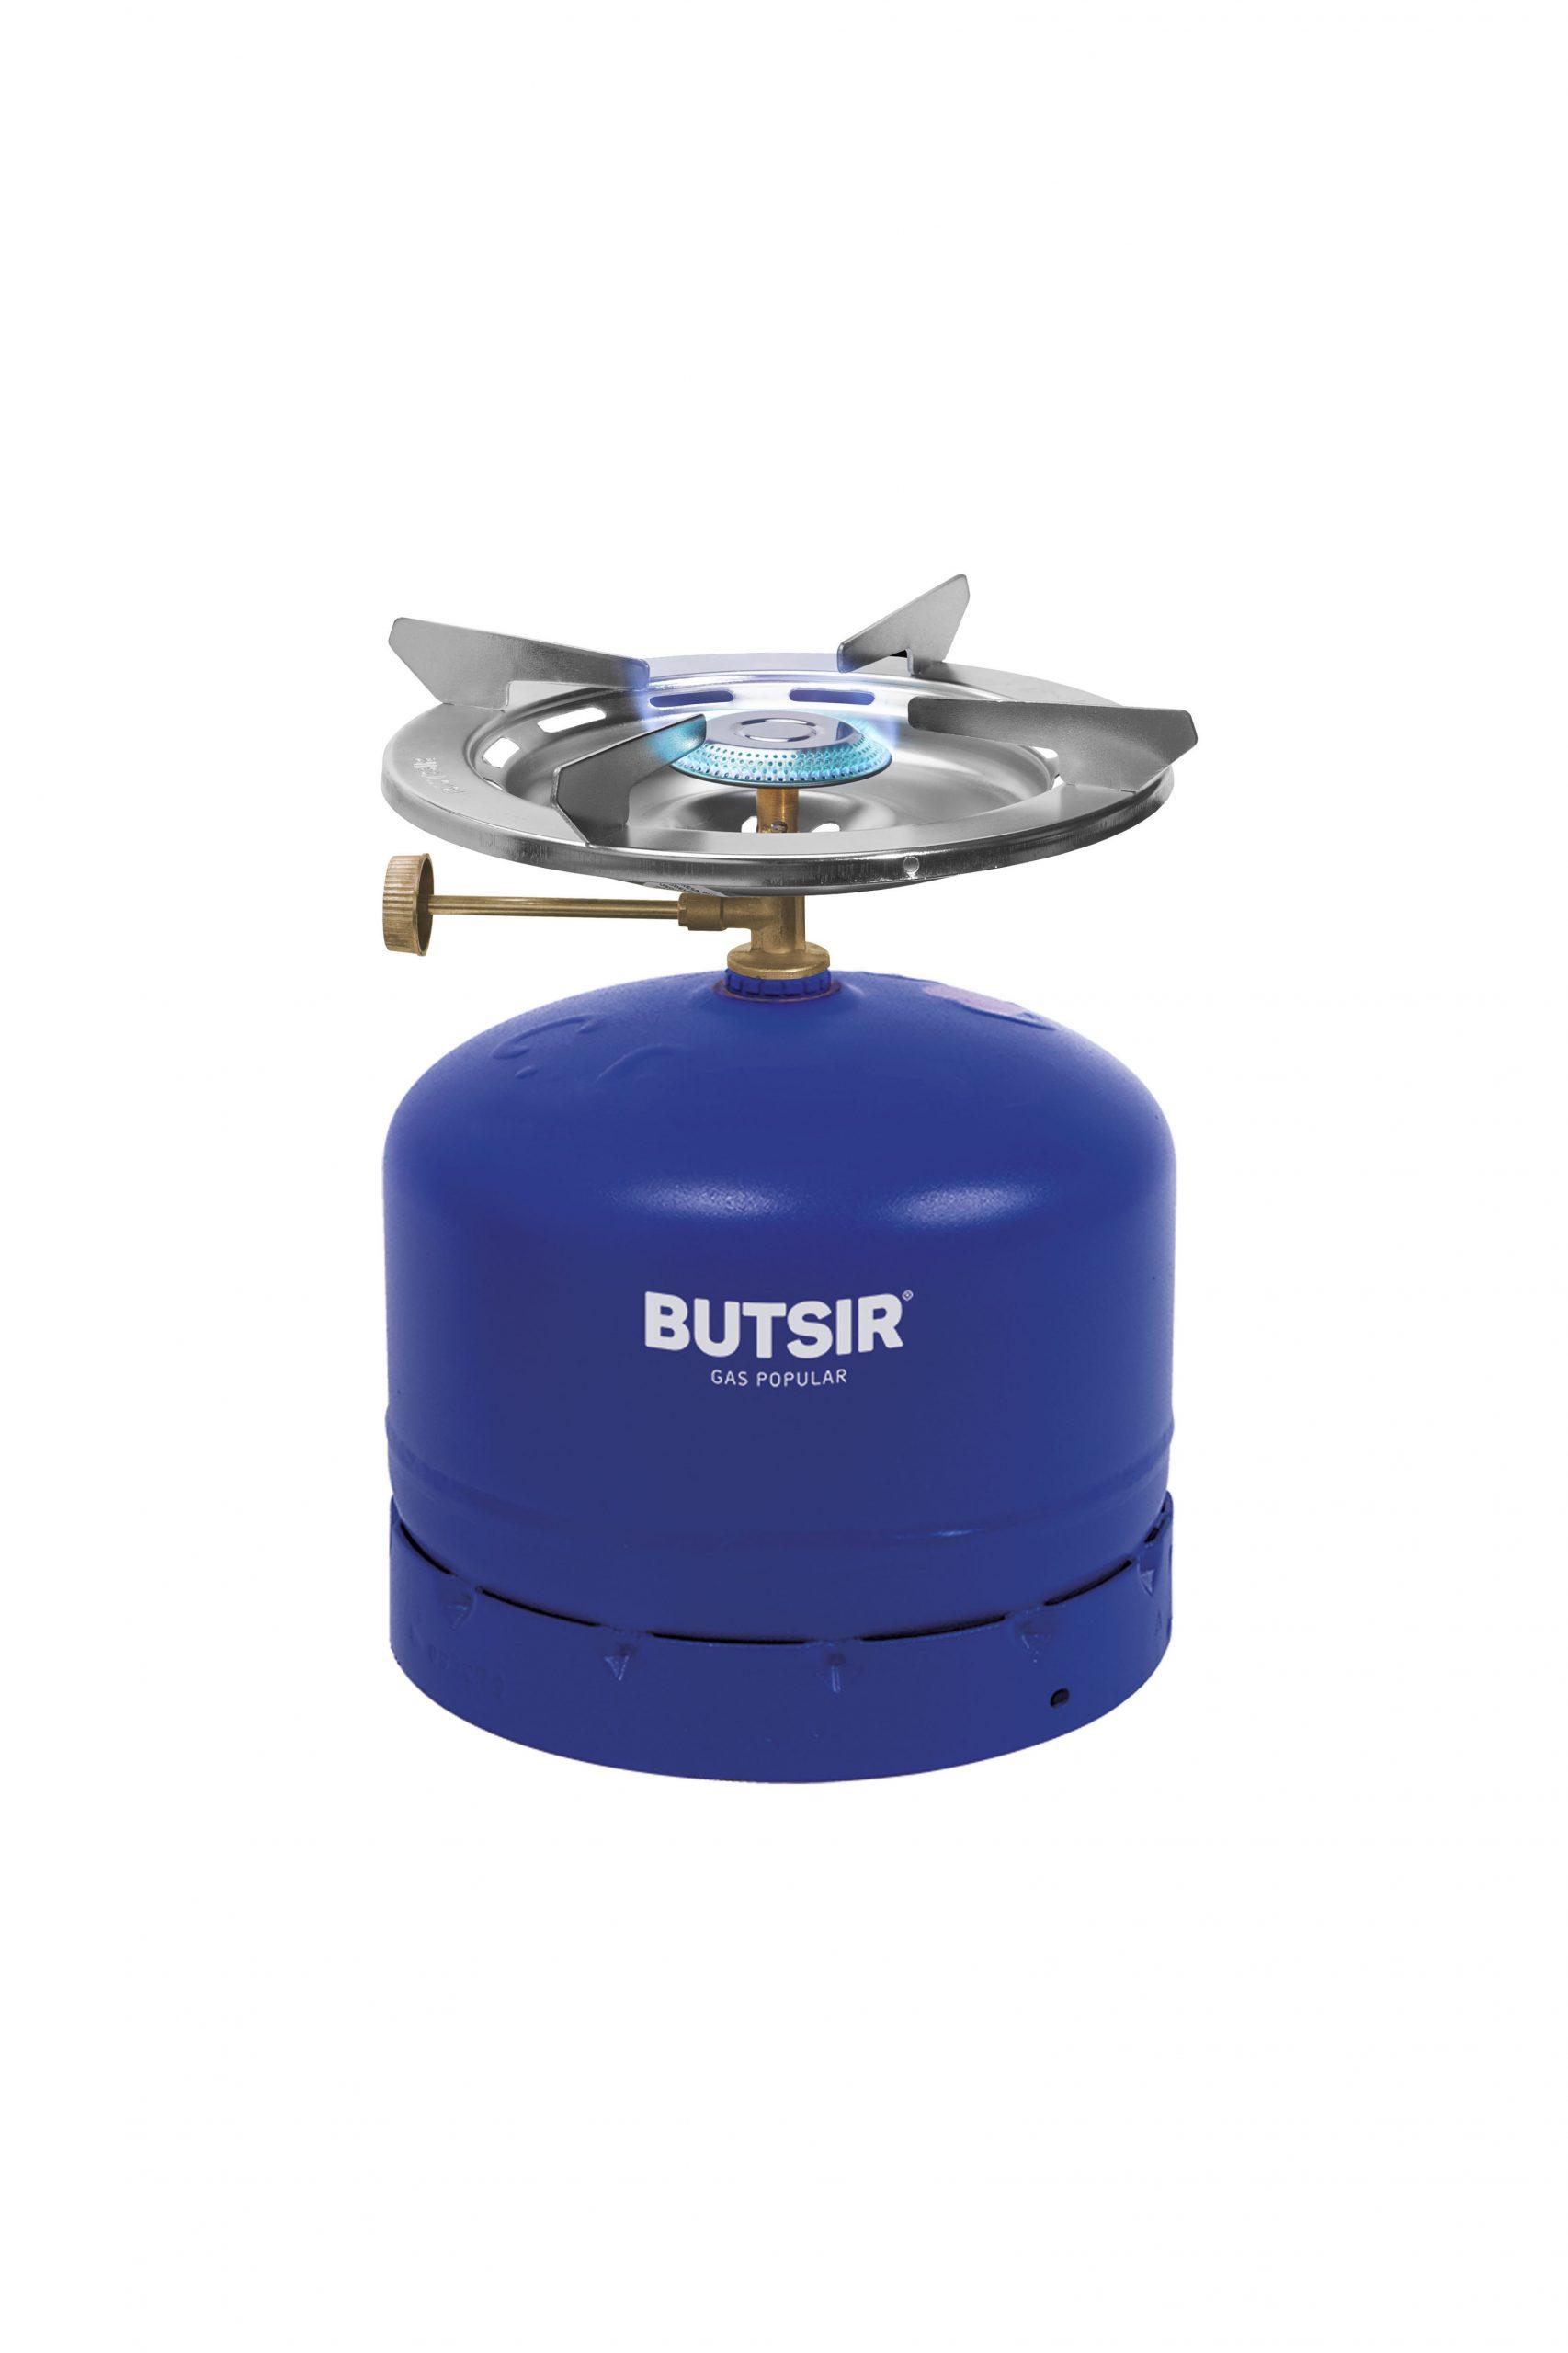 BL-BUTSIR-Fogon-Destroyer-azul-0-web-2